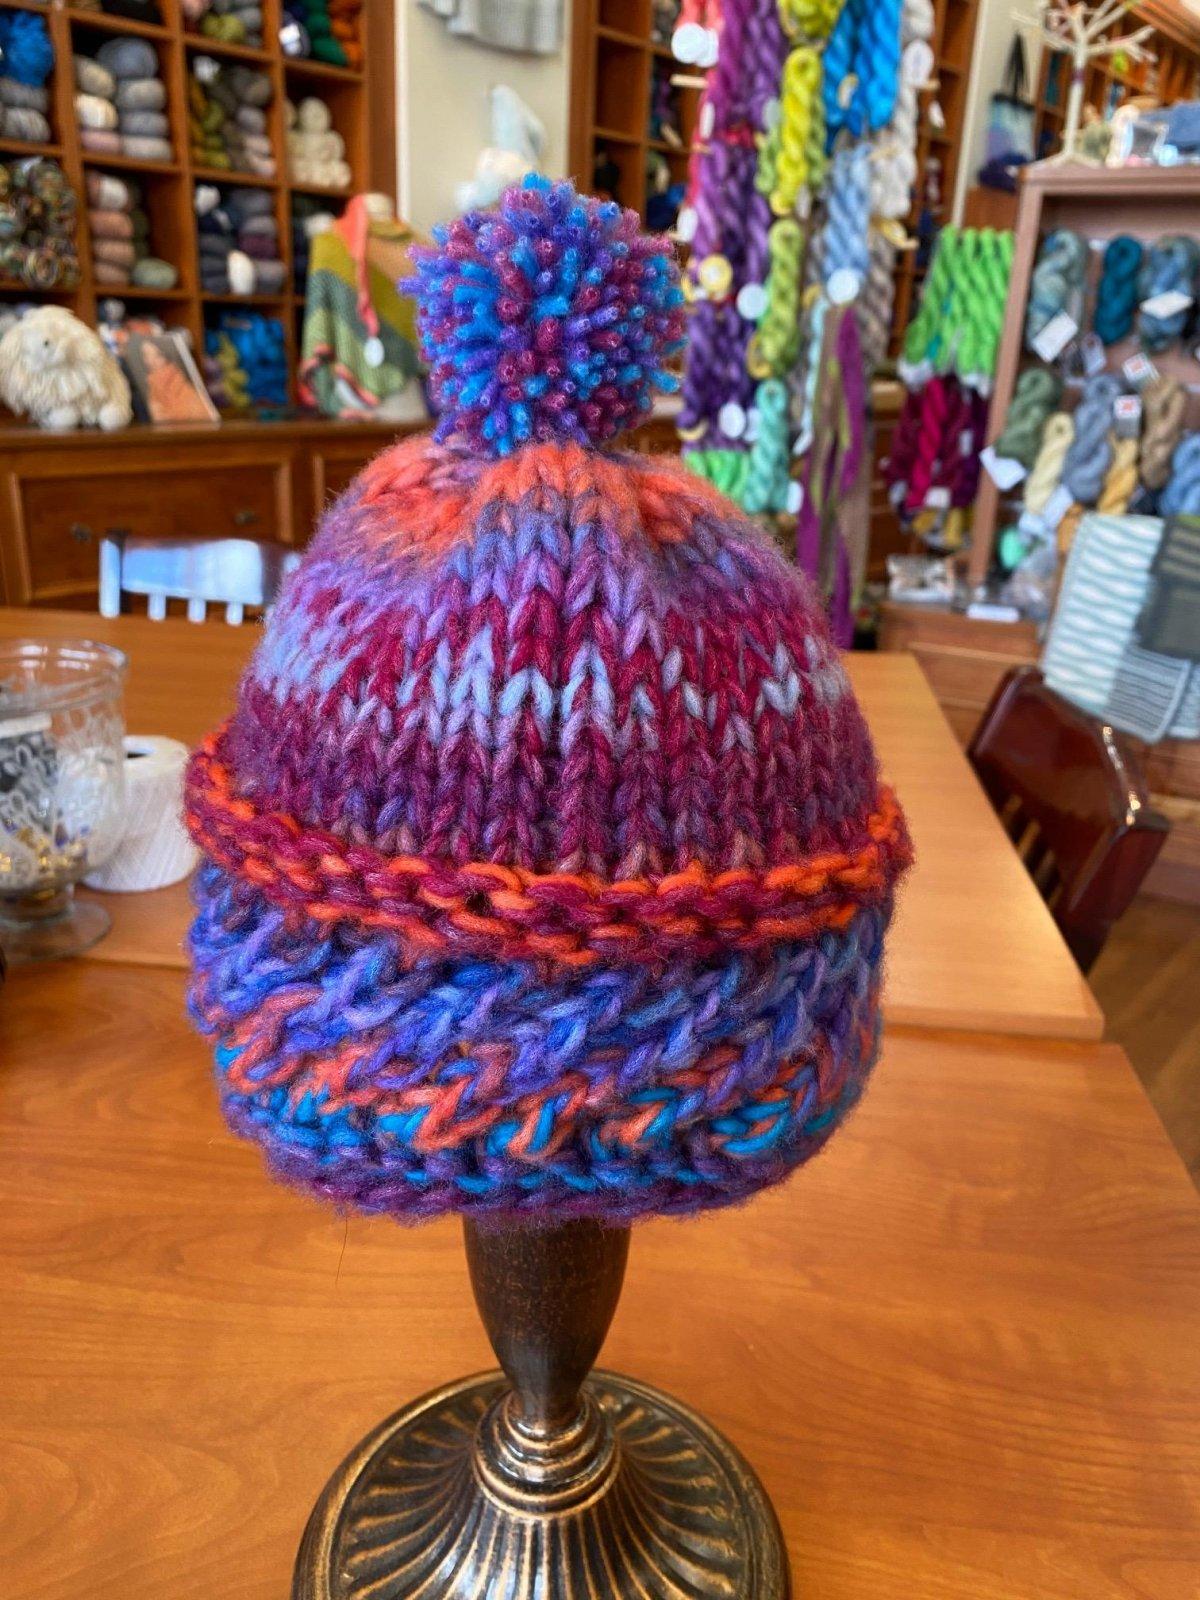 Perky Little Hat